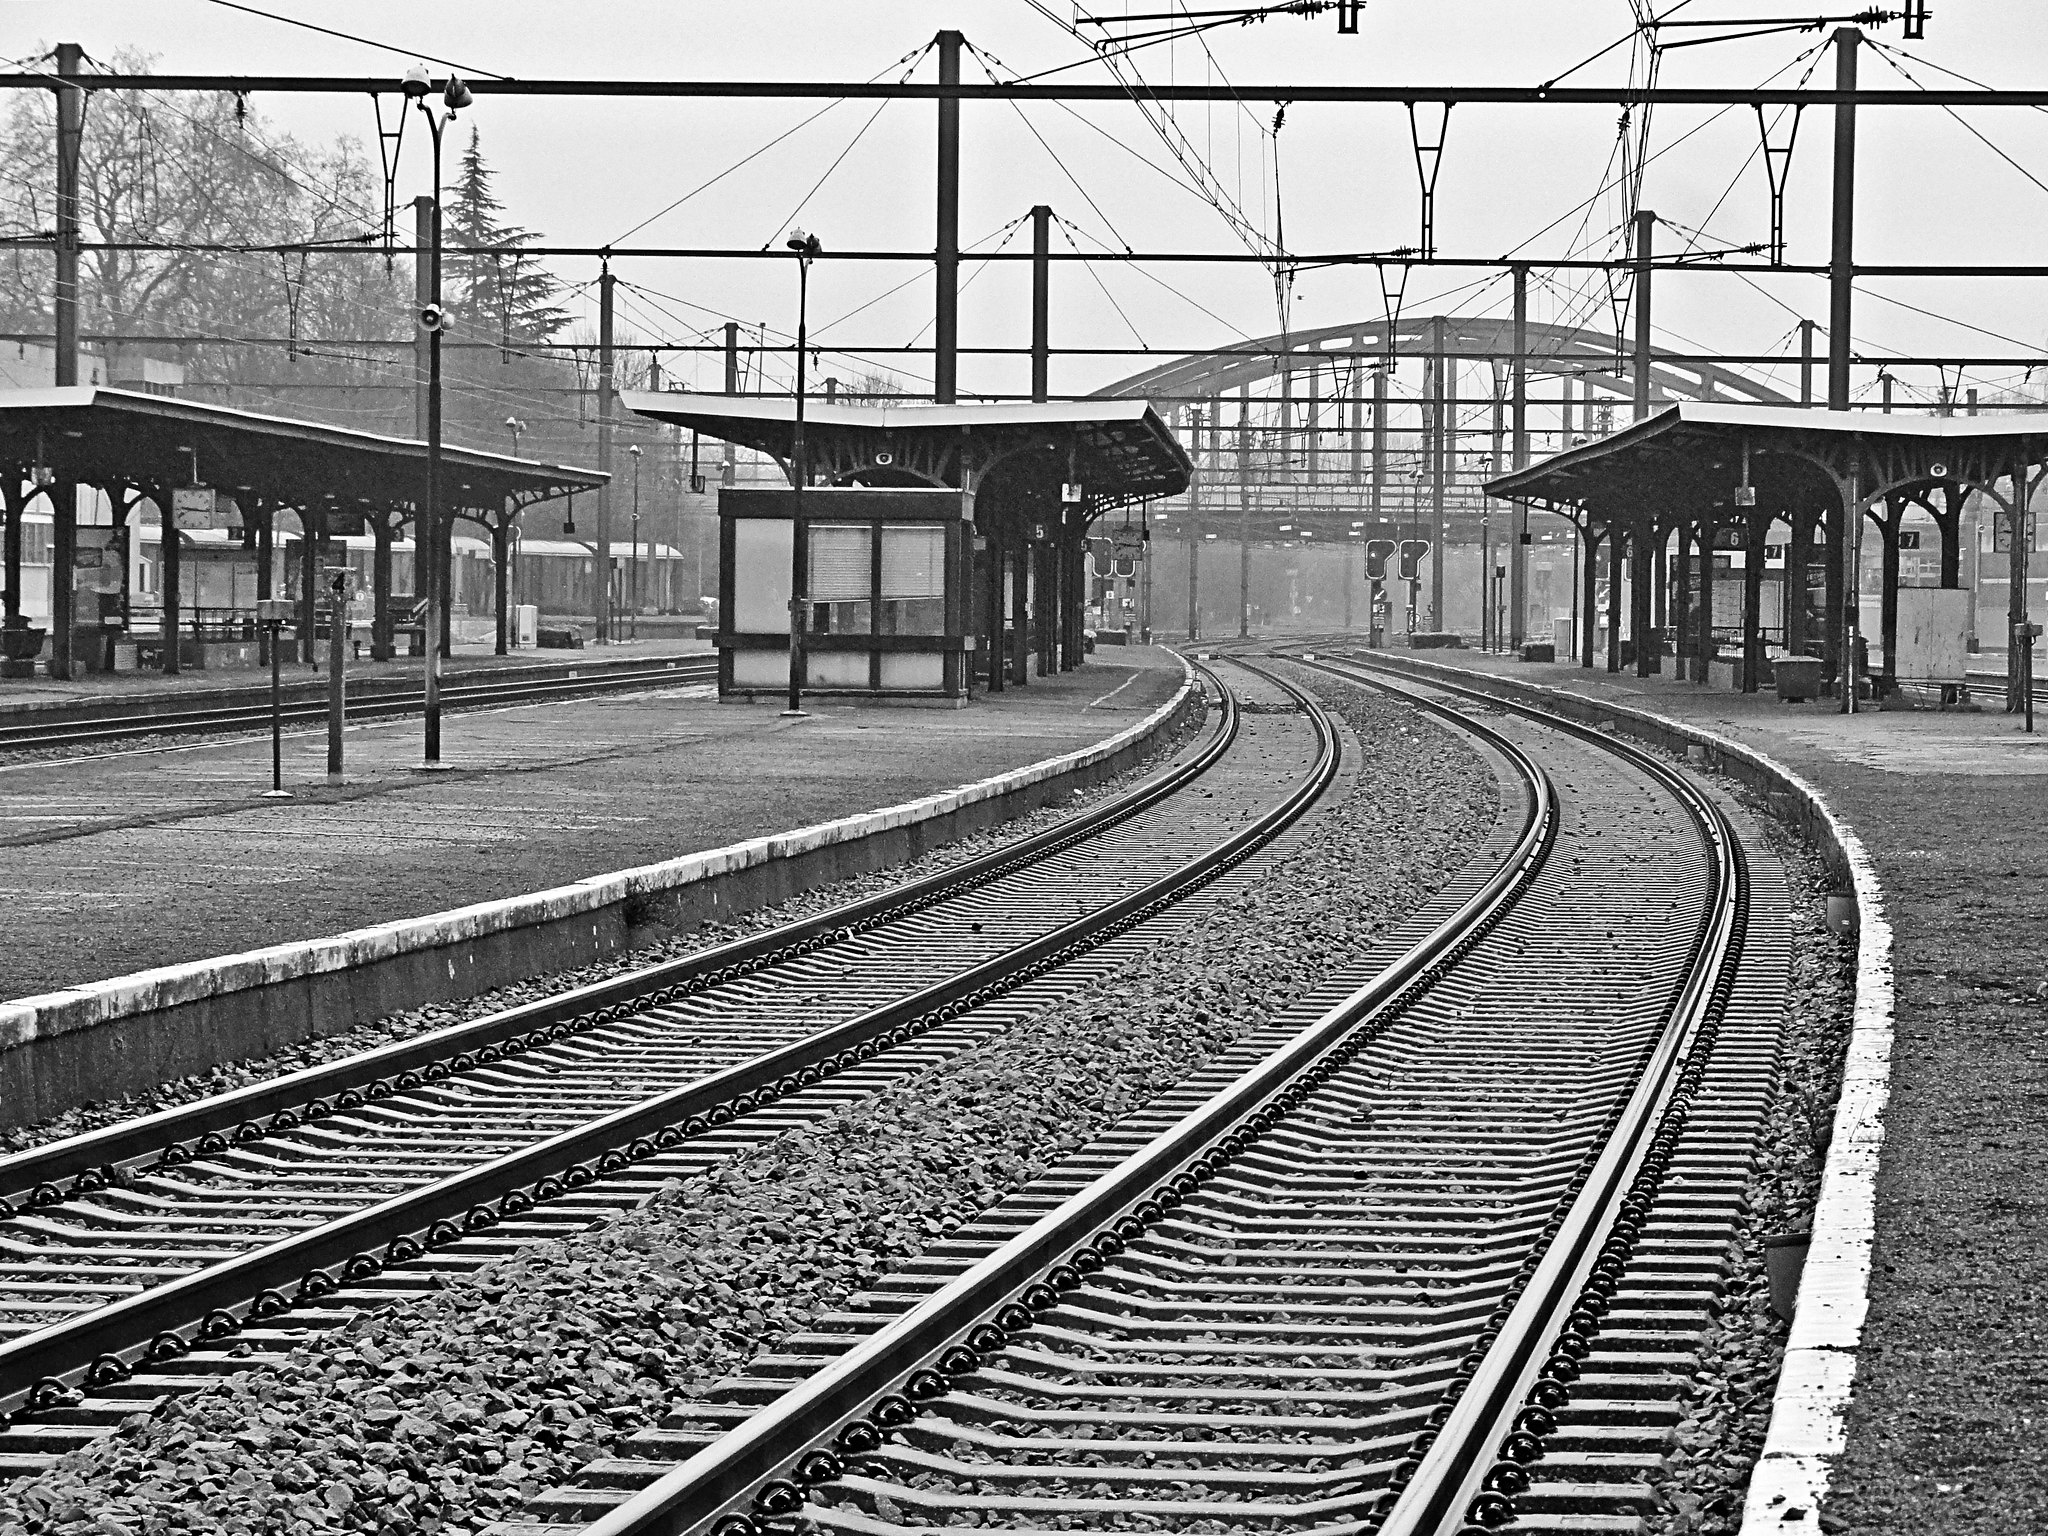 Dendermonde Station, Dendermonde, Belgium